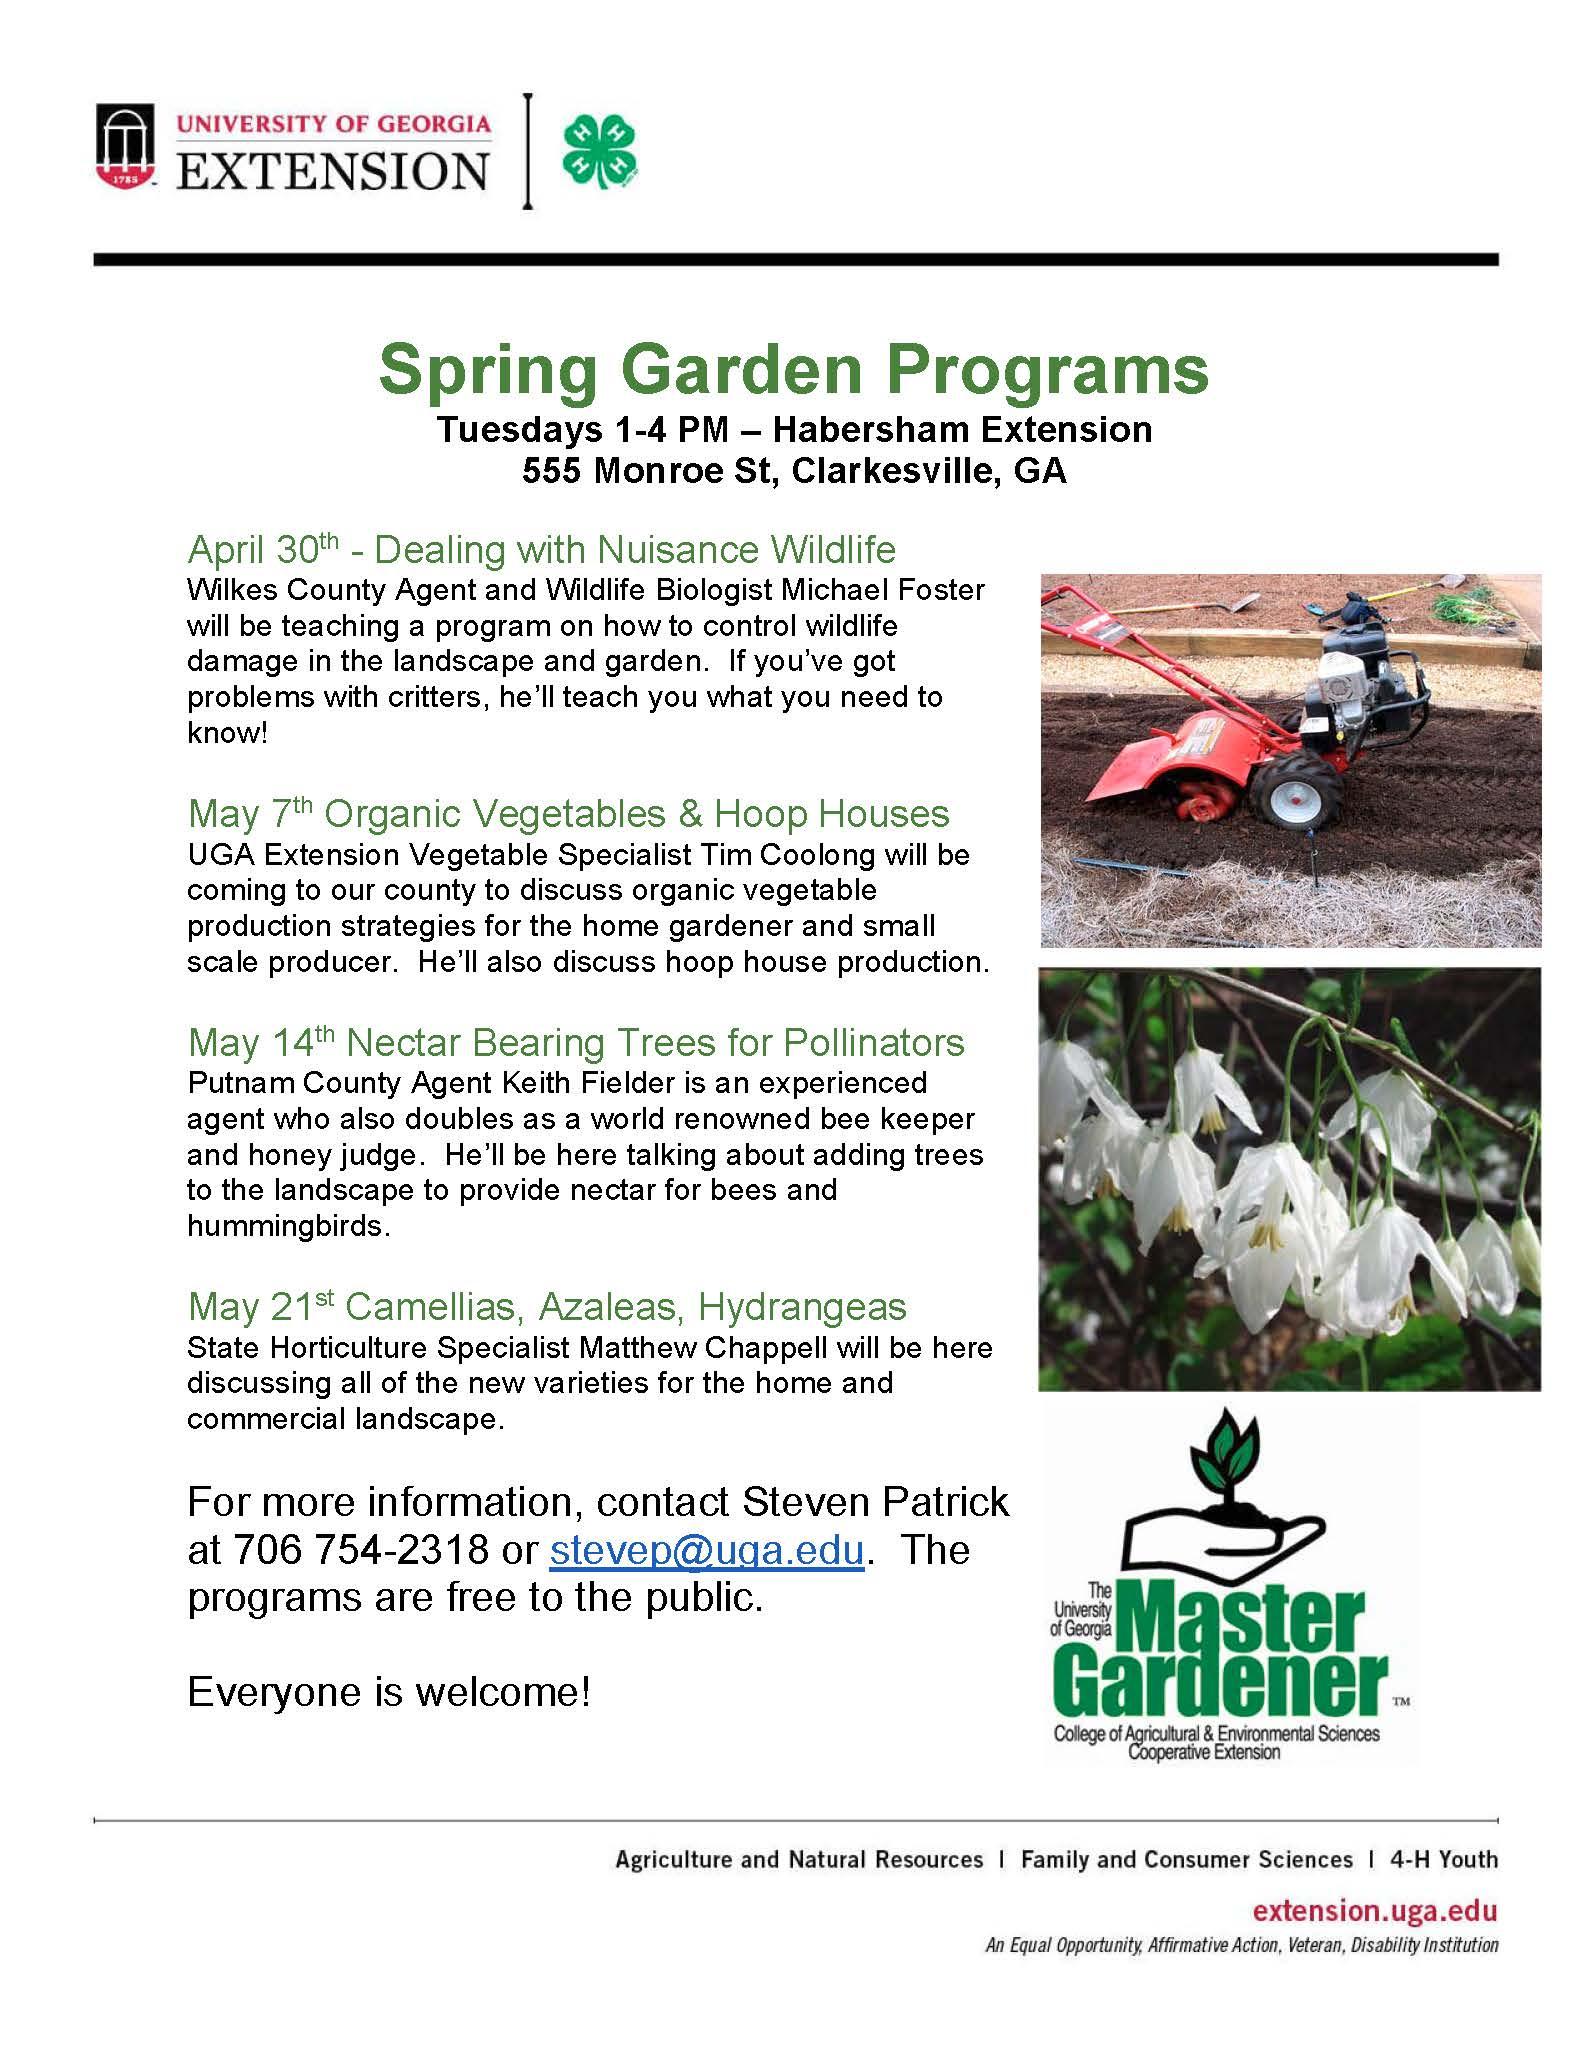 Spring Garden Programs 19.jpg